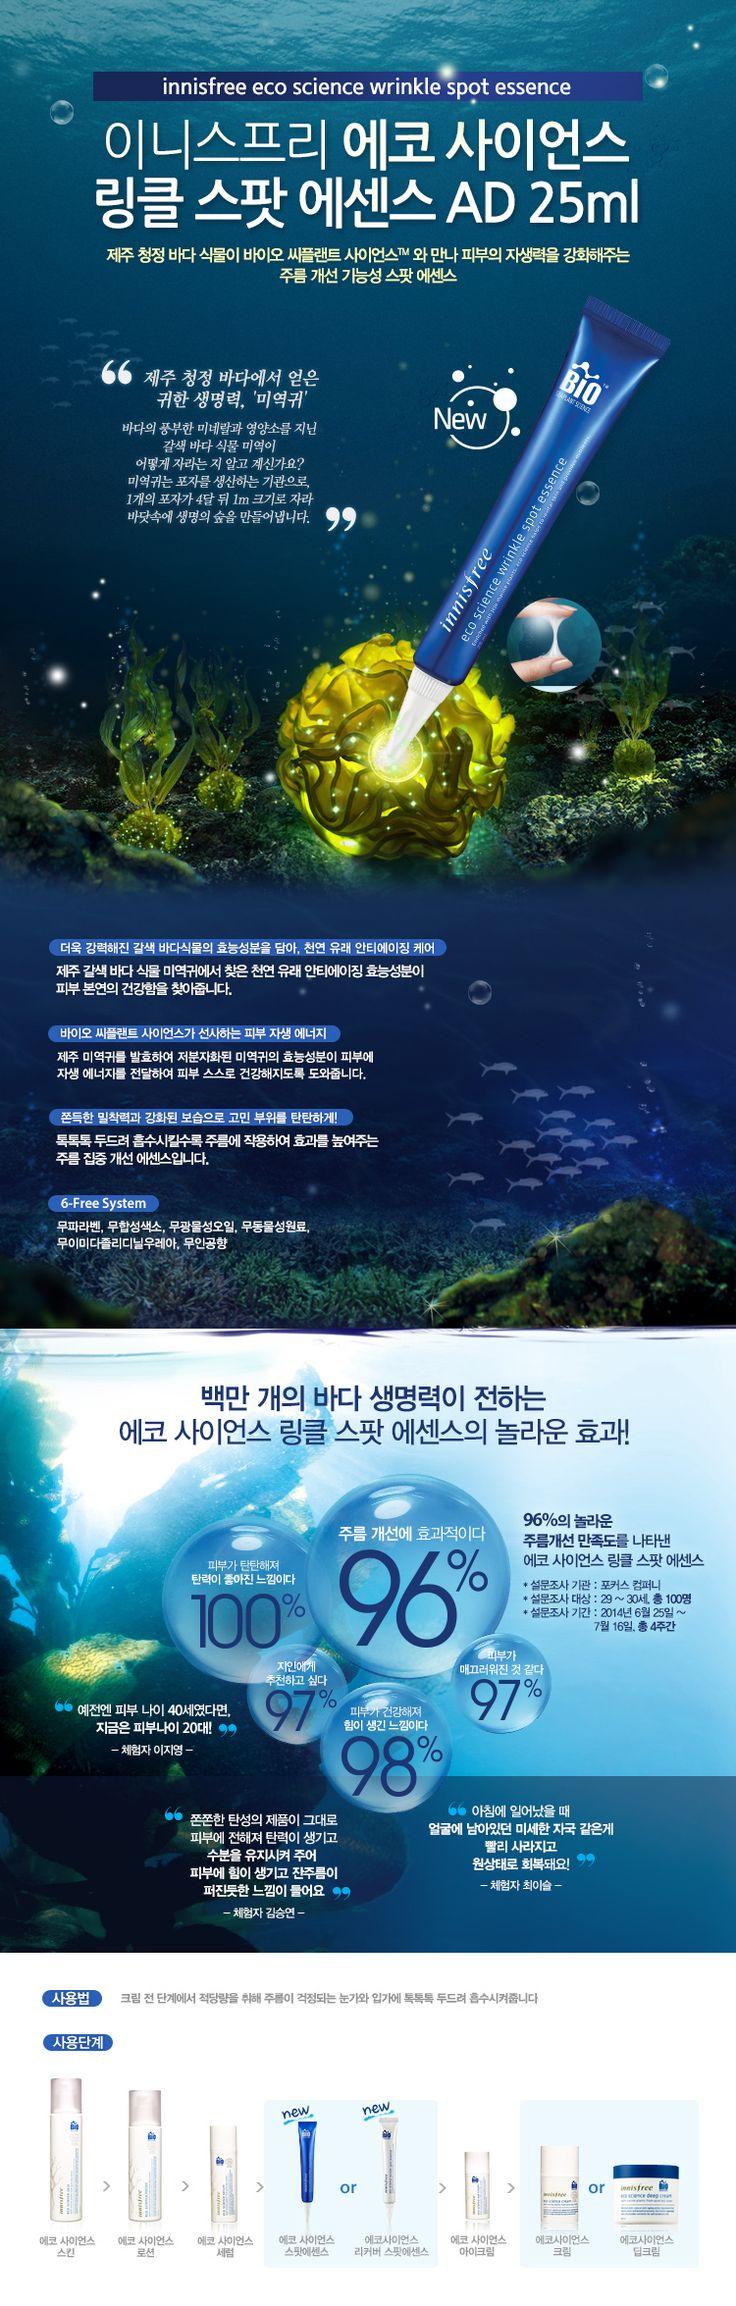 Natural benefit from Jeju, innisfree